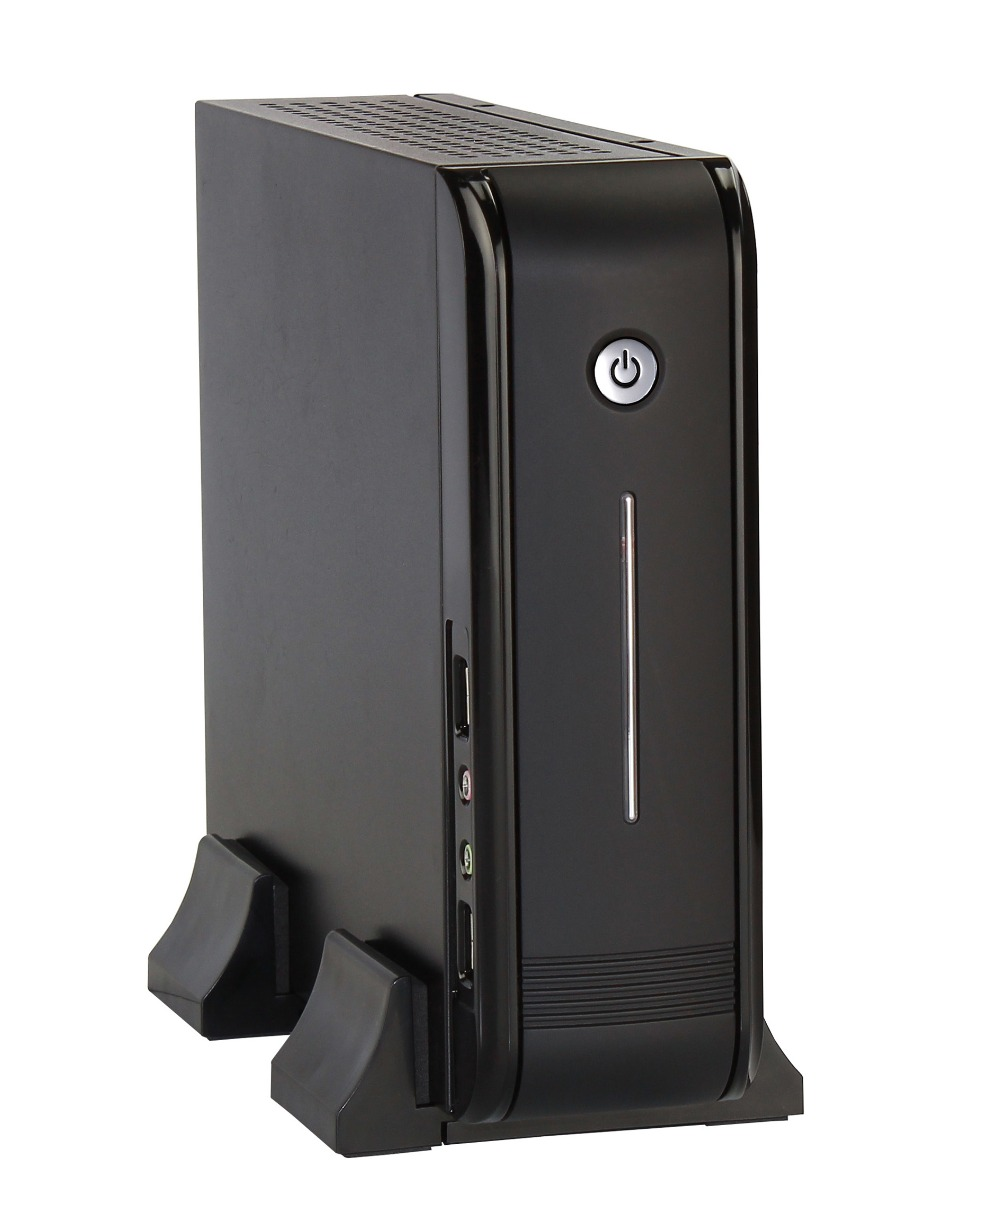 Realan 3015 Mini ITX Commercial Desktop Computer SGCC Office Computer, Cheap Desktop PC Case without power supply e mini training m3 computer case itx desktop power supply aluminum nobility